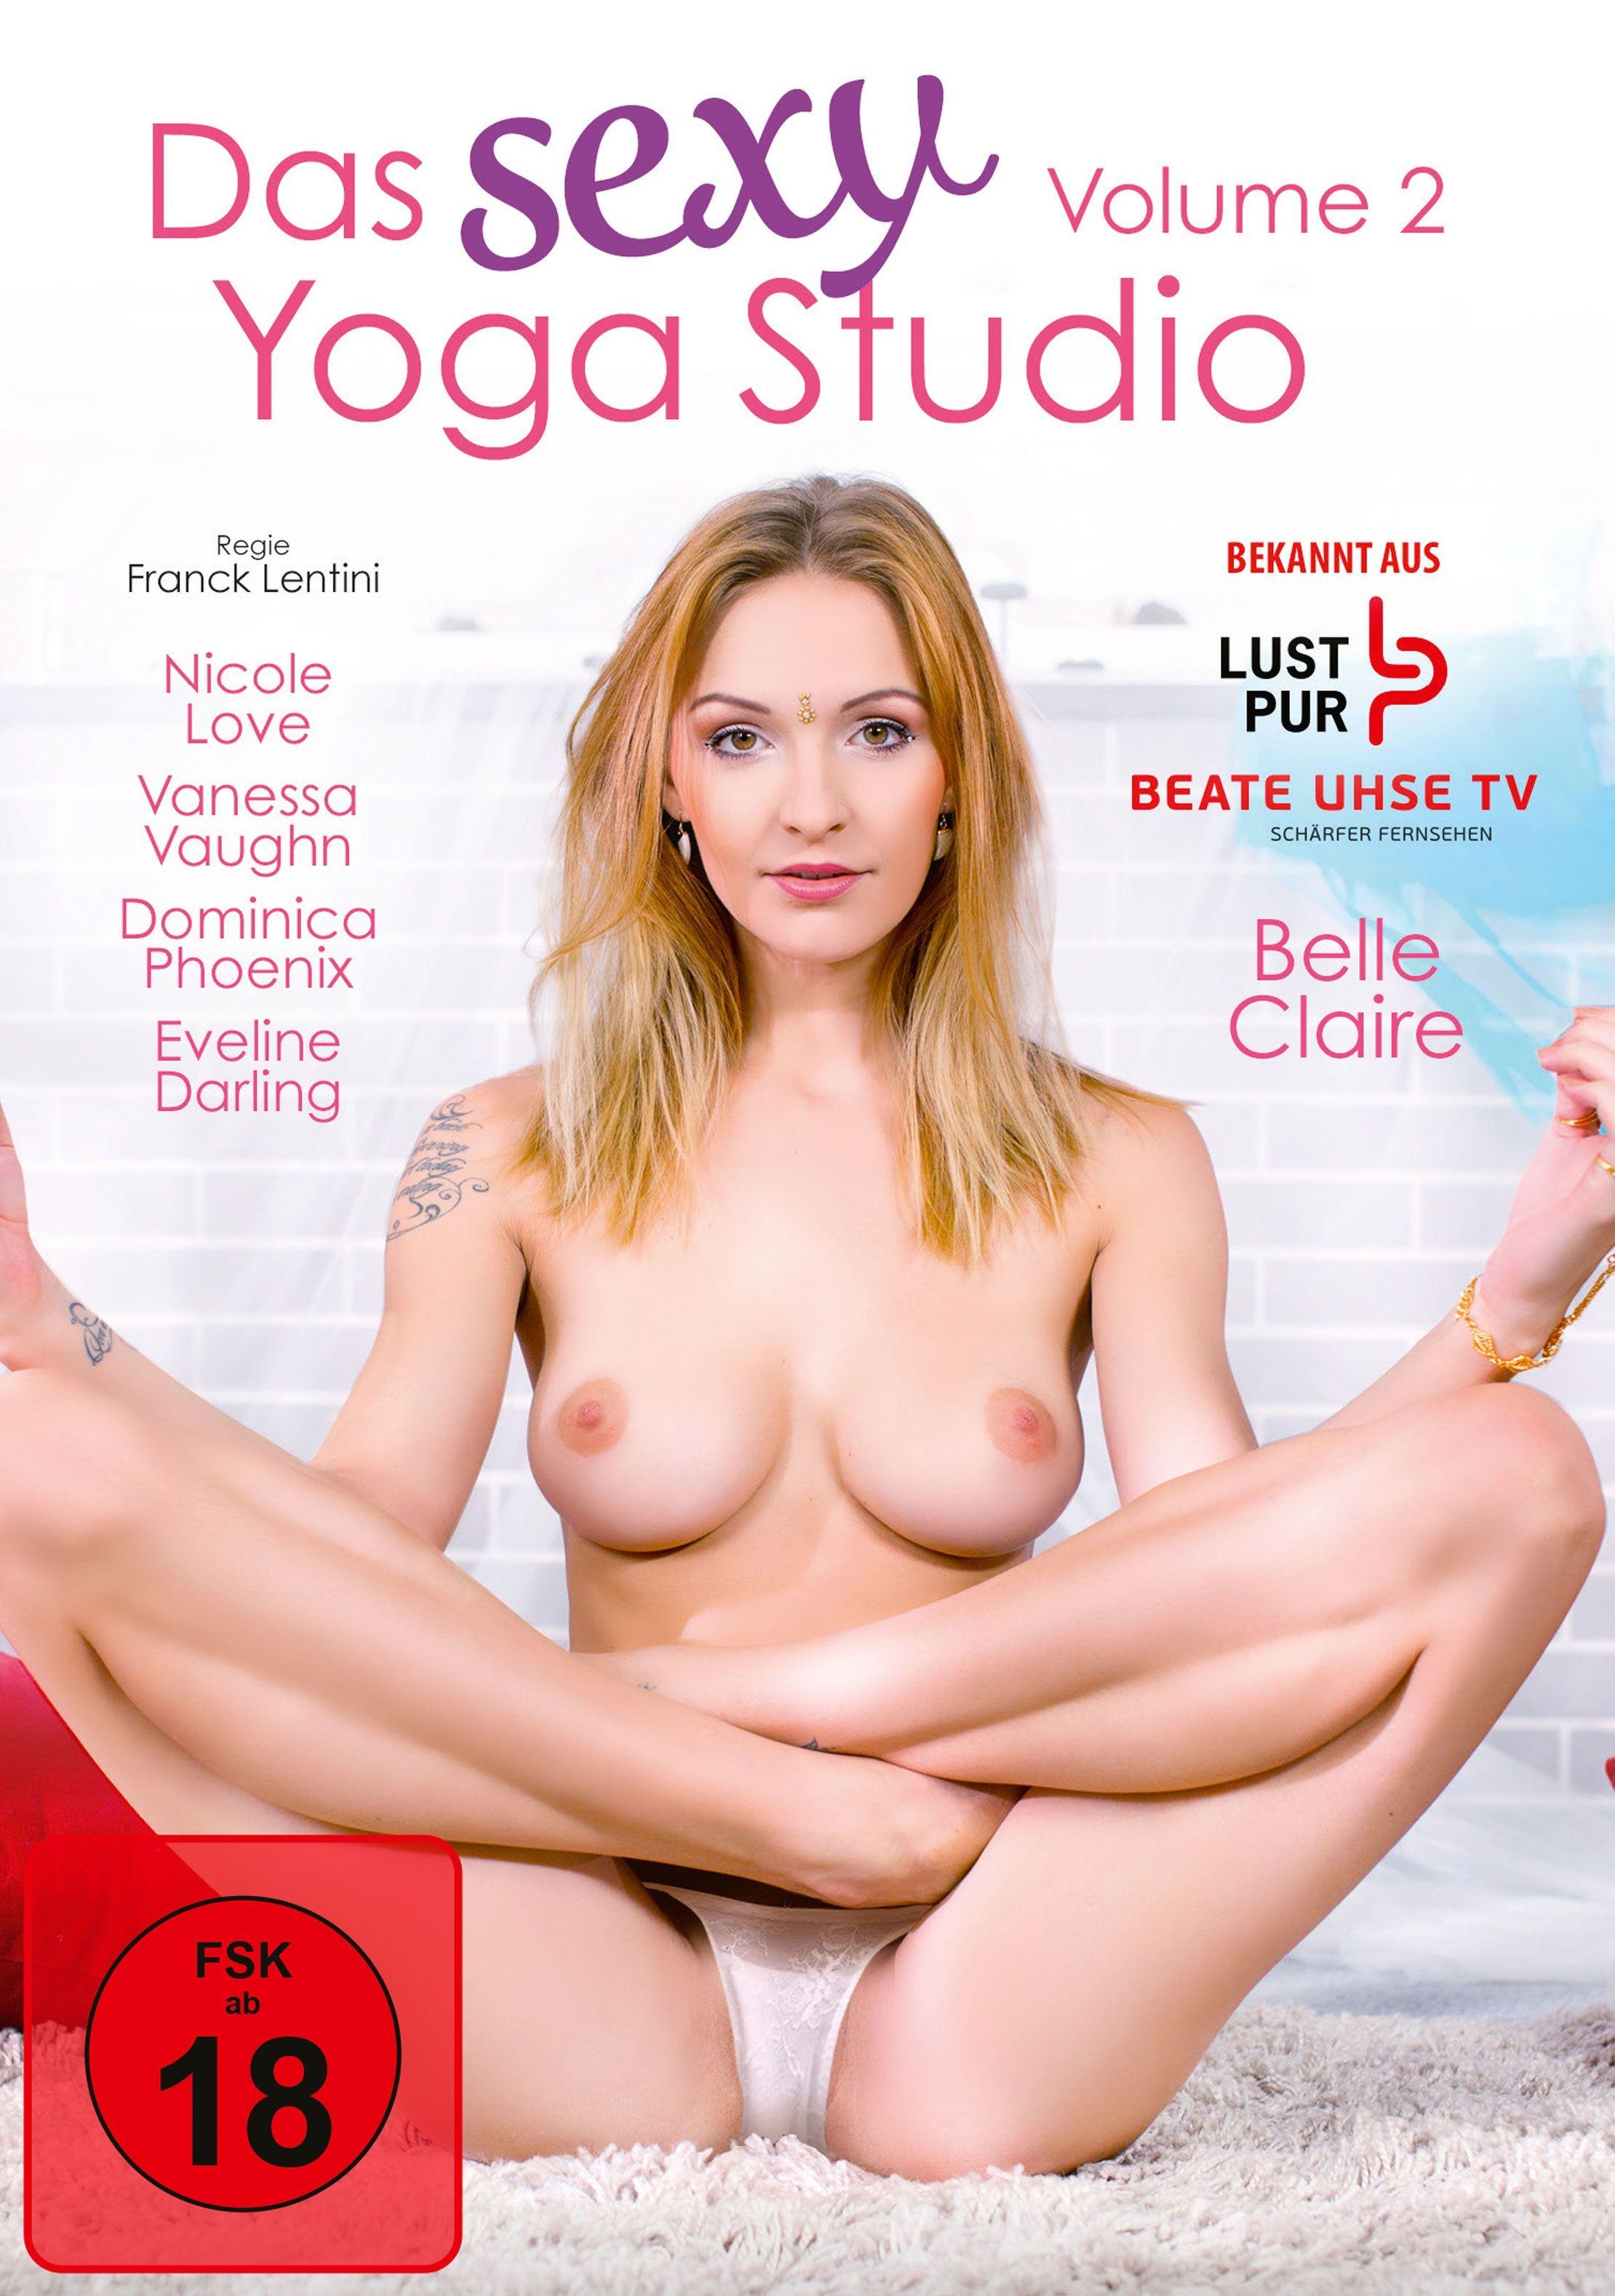 Yoga Studio, Das - Vol. 2